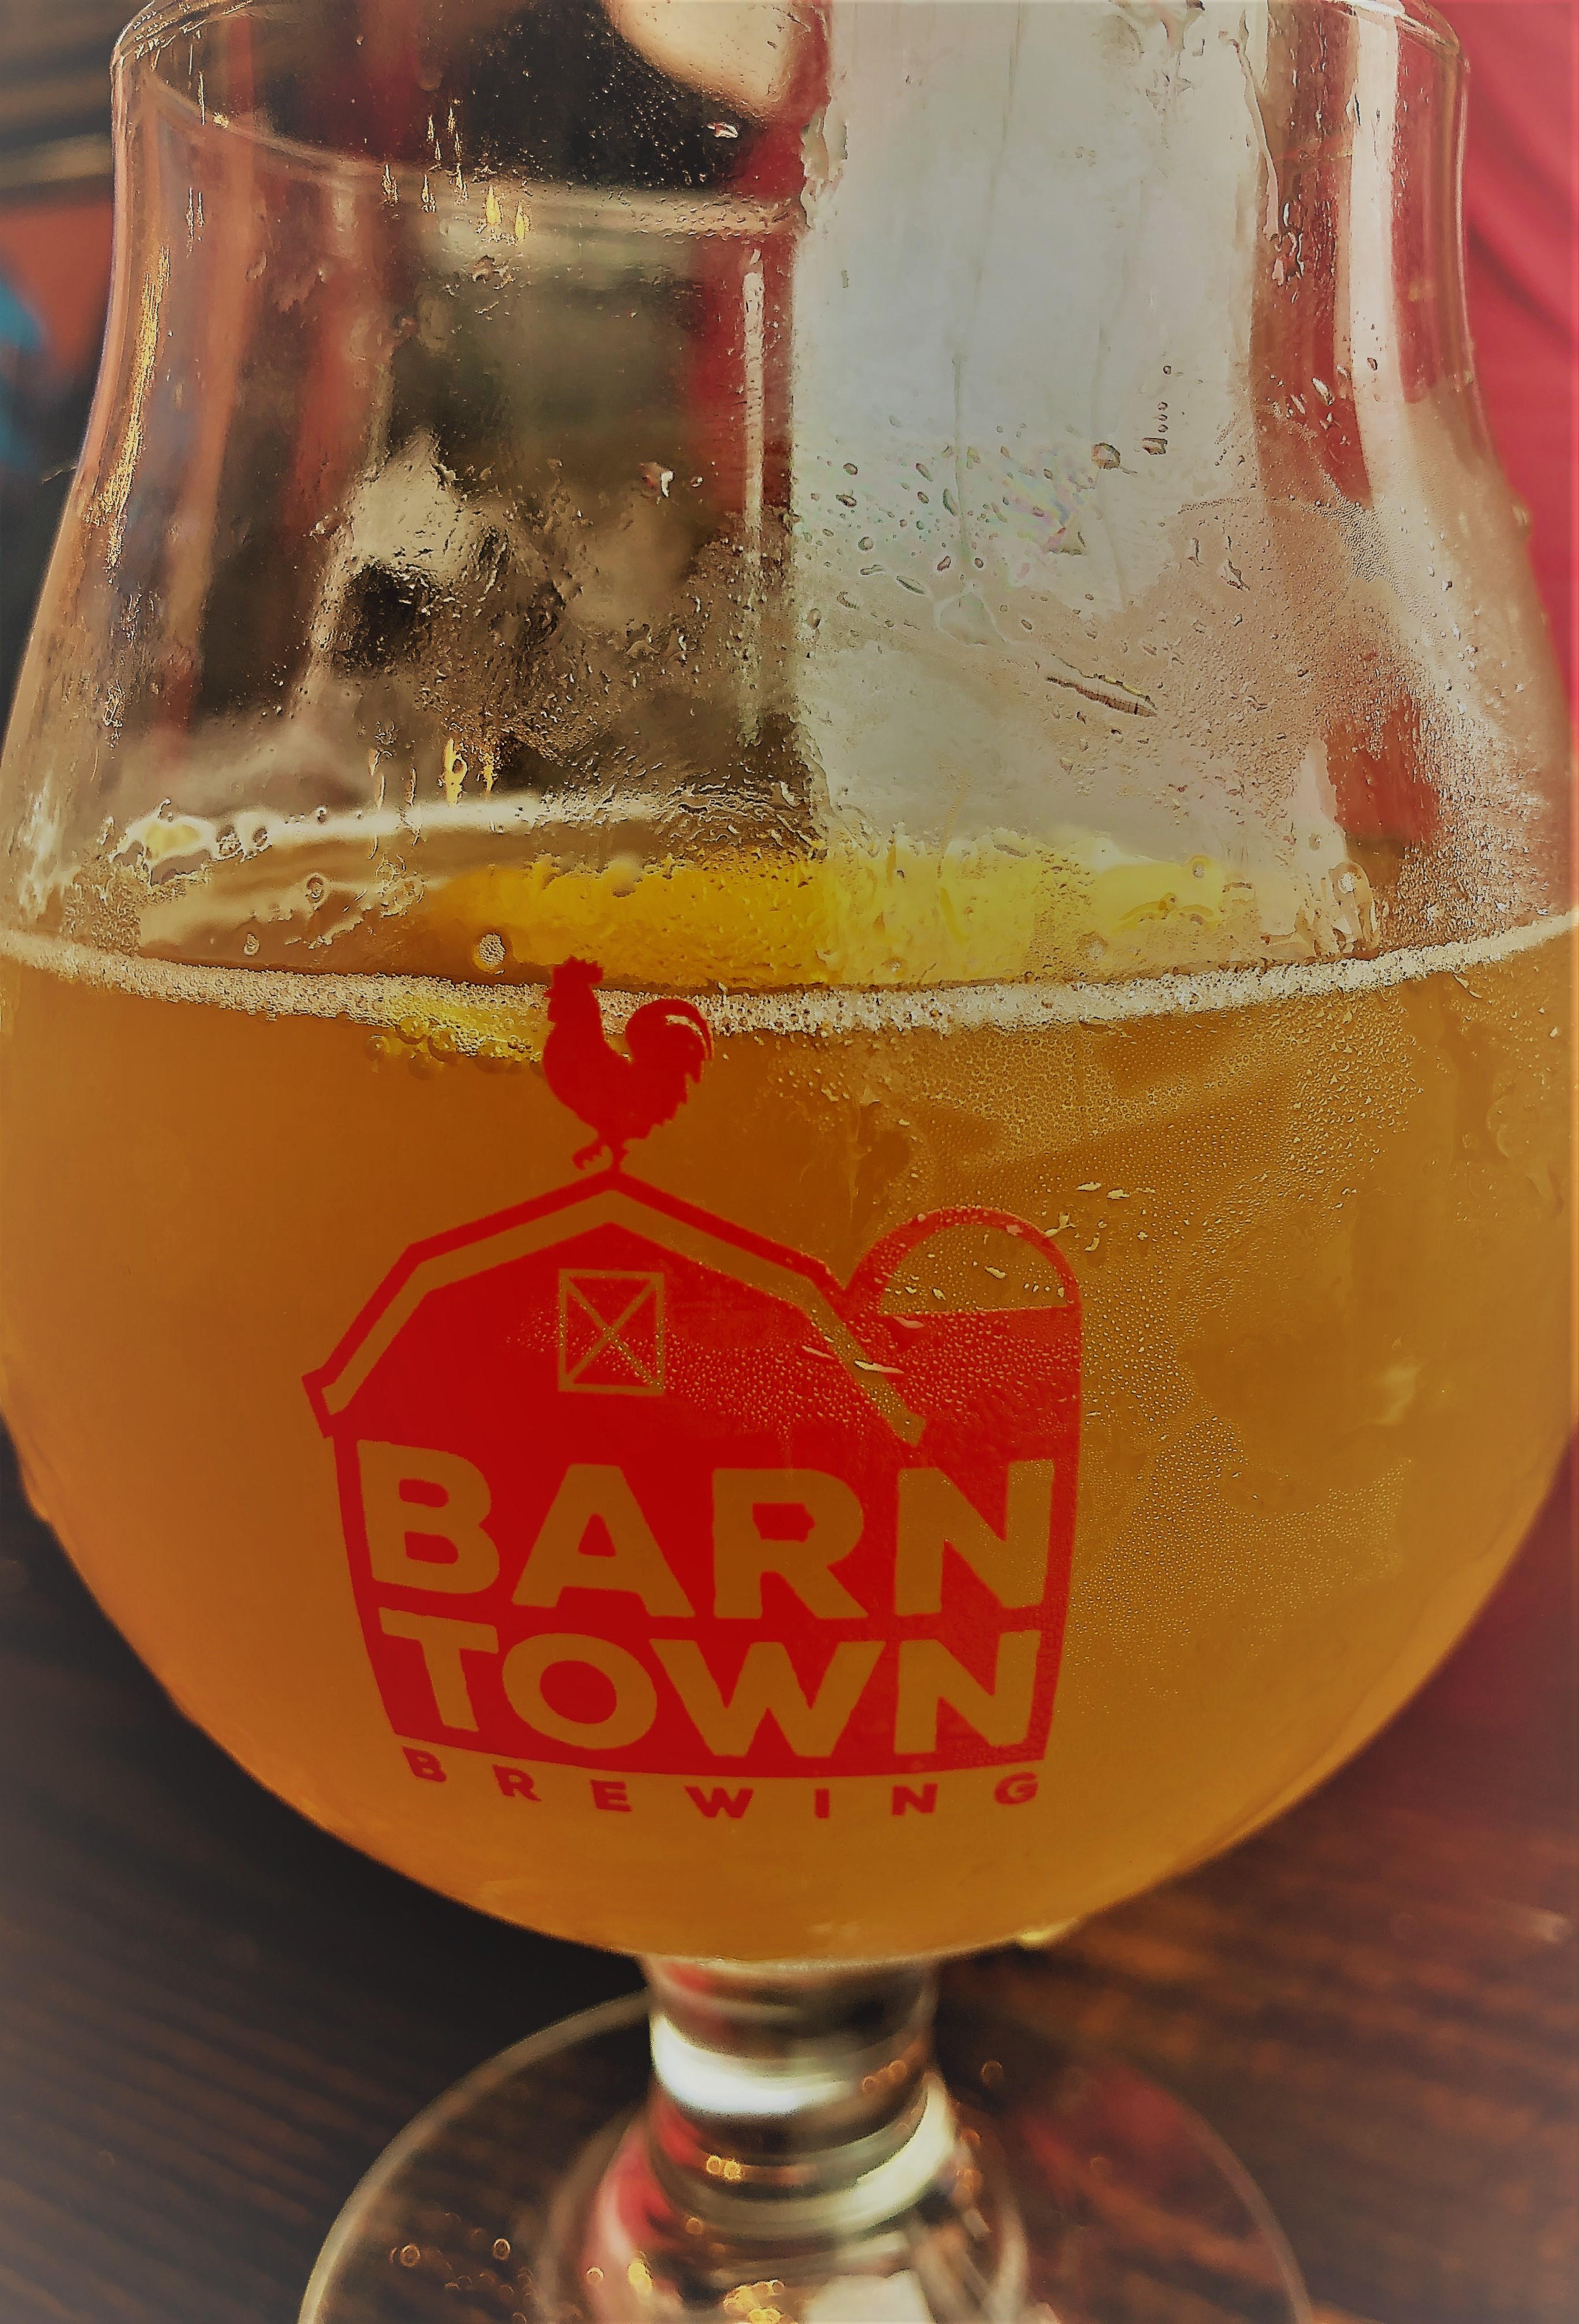 Barn Town Brewing - West Des Moines, Iowa | Travel Iowa | #ThisIsIowa